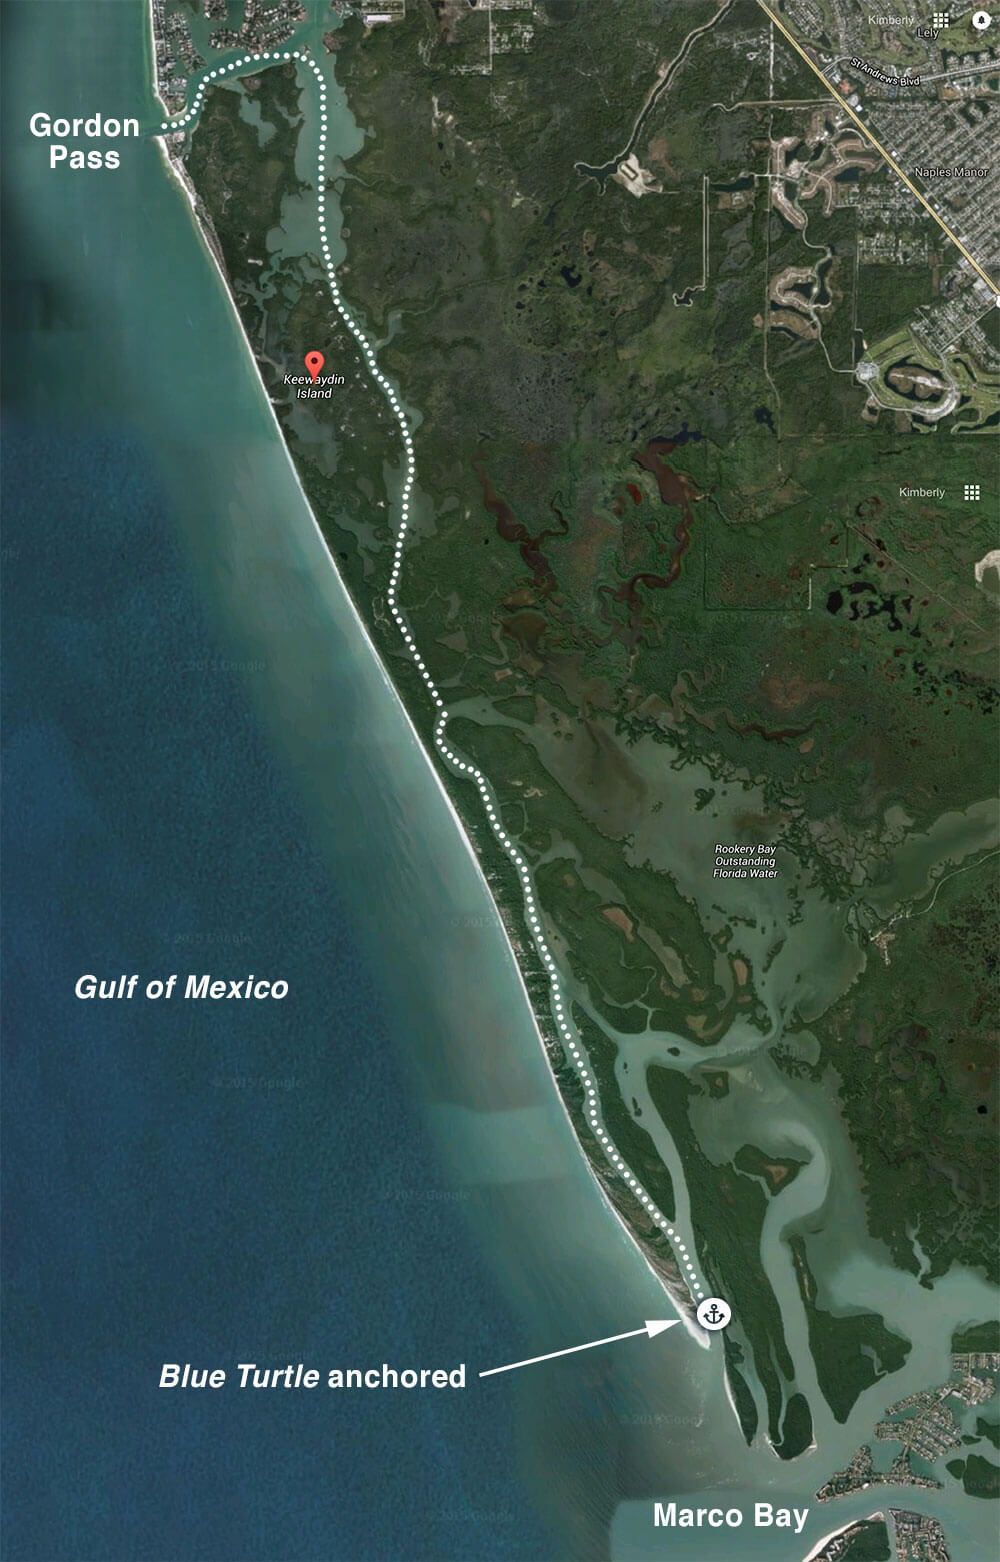 Keewaydin Island Map Post Christmas trip to Keewaydin Island | Blue Turtle Trawler